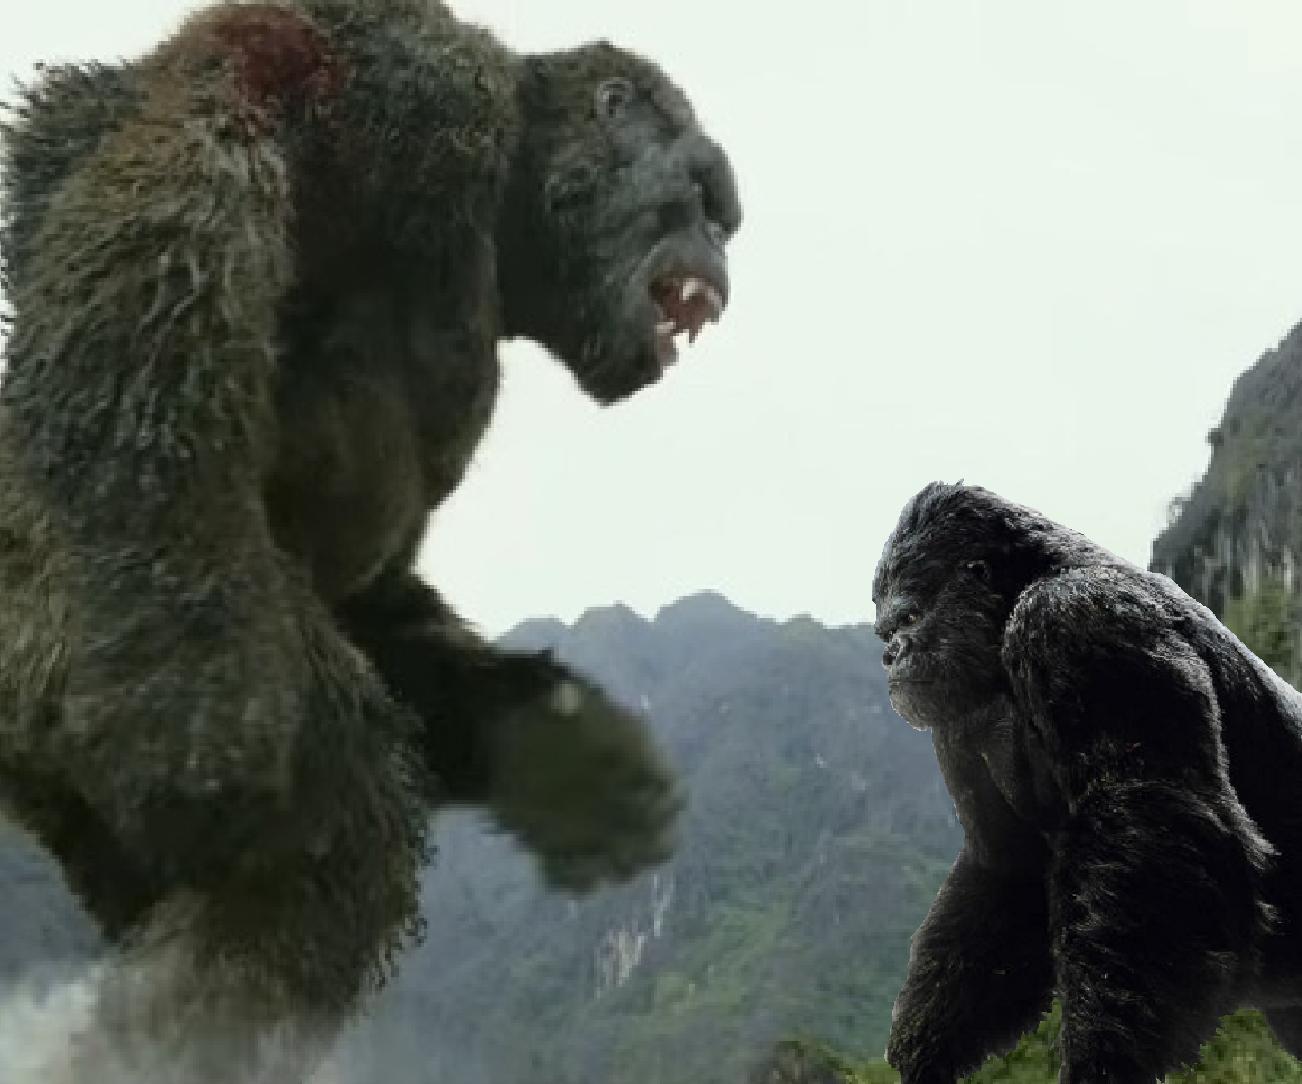 Kong 2017 Vs King Kong 2005 In 2020 King Kong 2005 King Kong Kong 2017